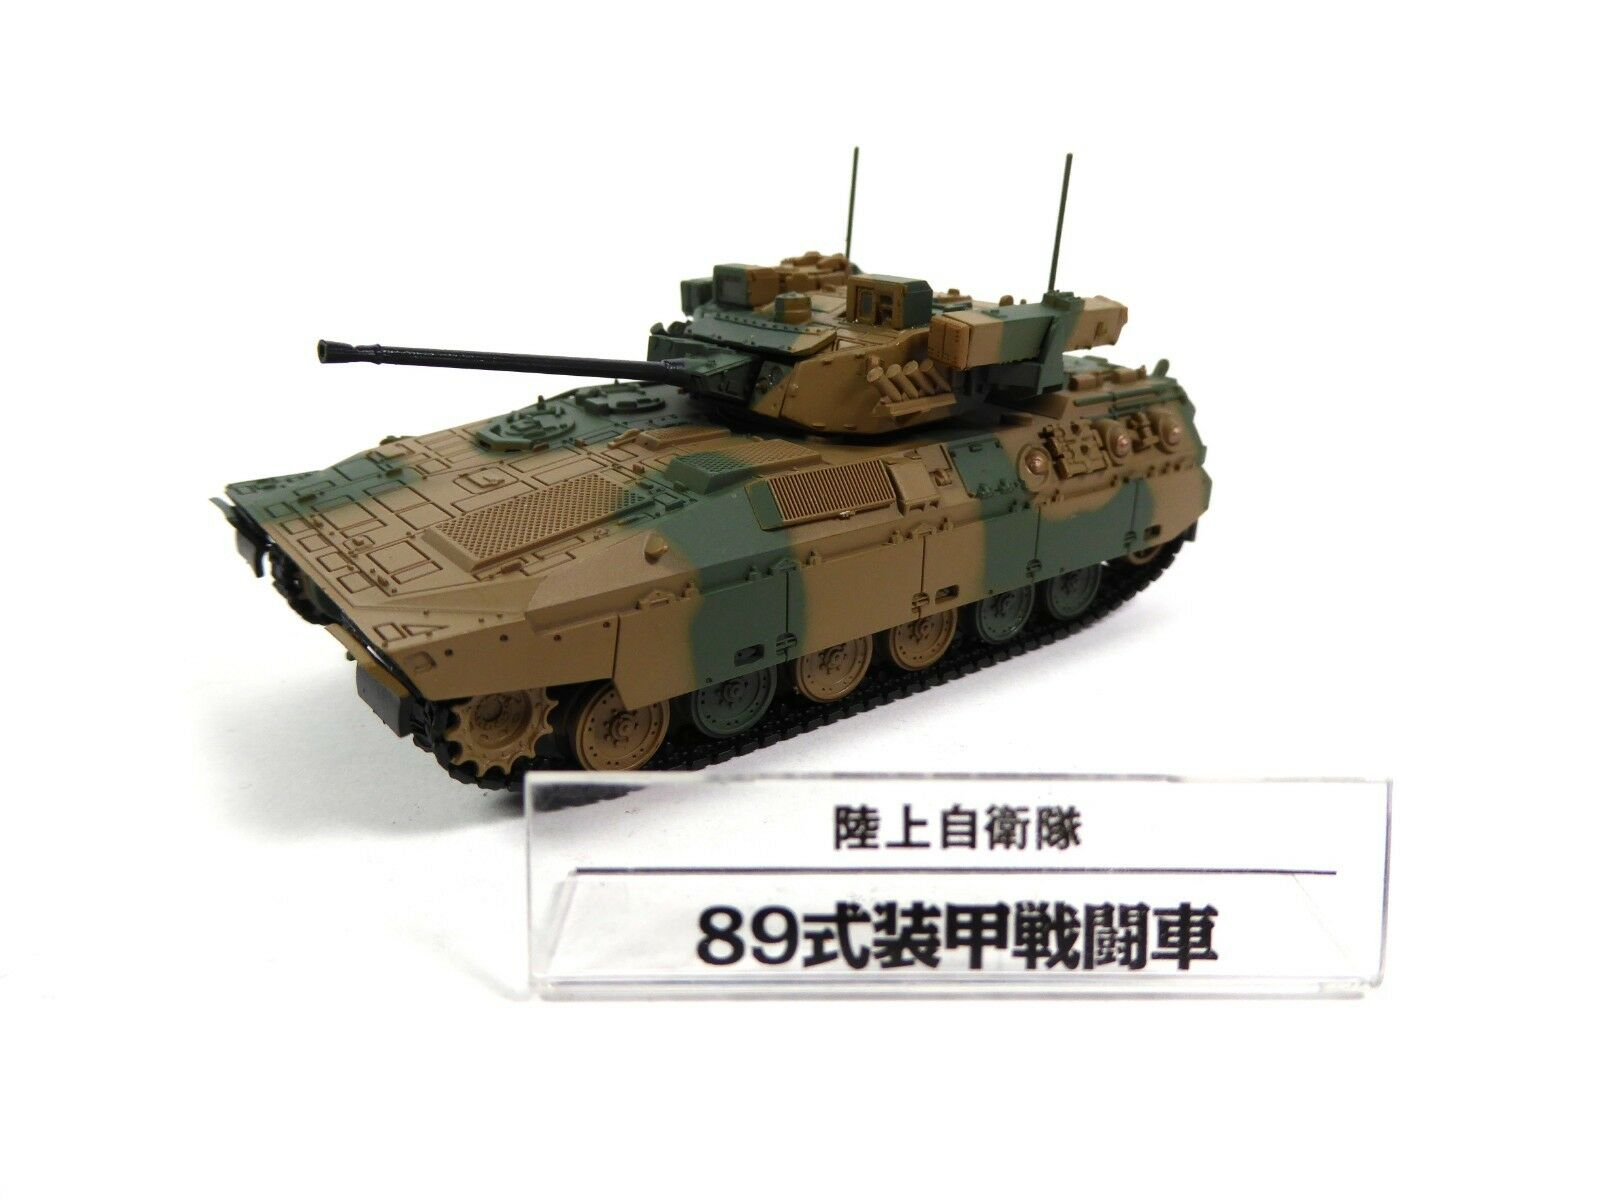 Tank Mitsubishi Type 89 IFV - 1 72 JGSDF Japan Army Militärfahrzeug - SD11